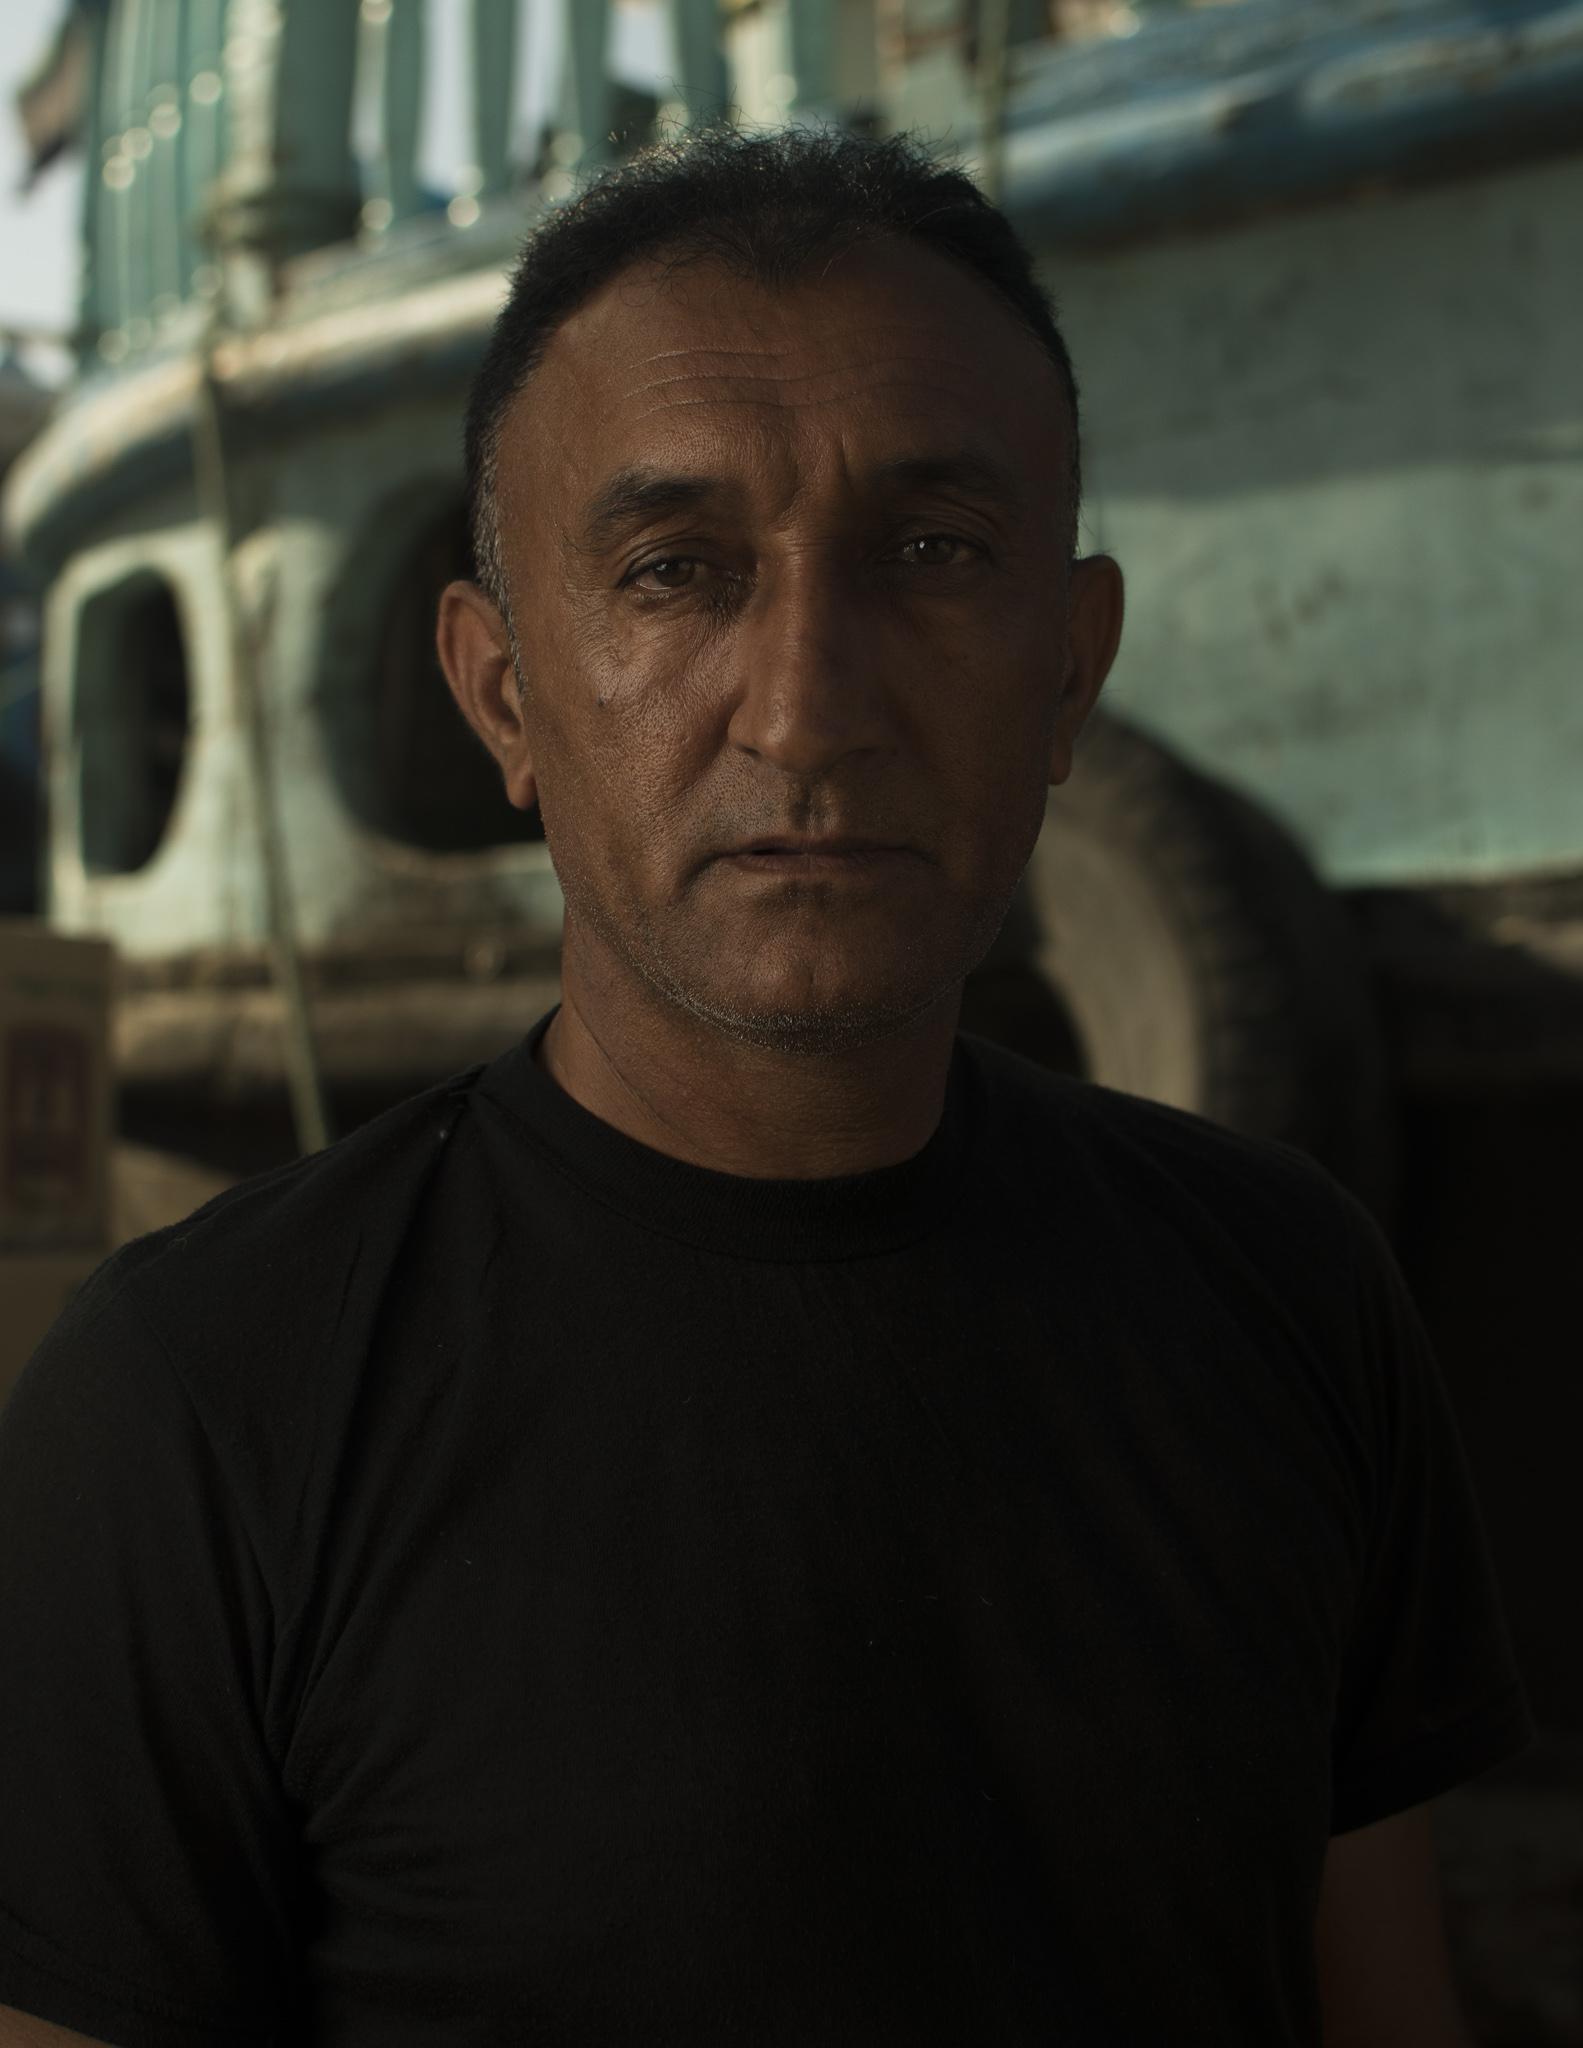 Dock worker, Deira, Dubai